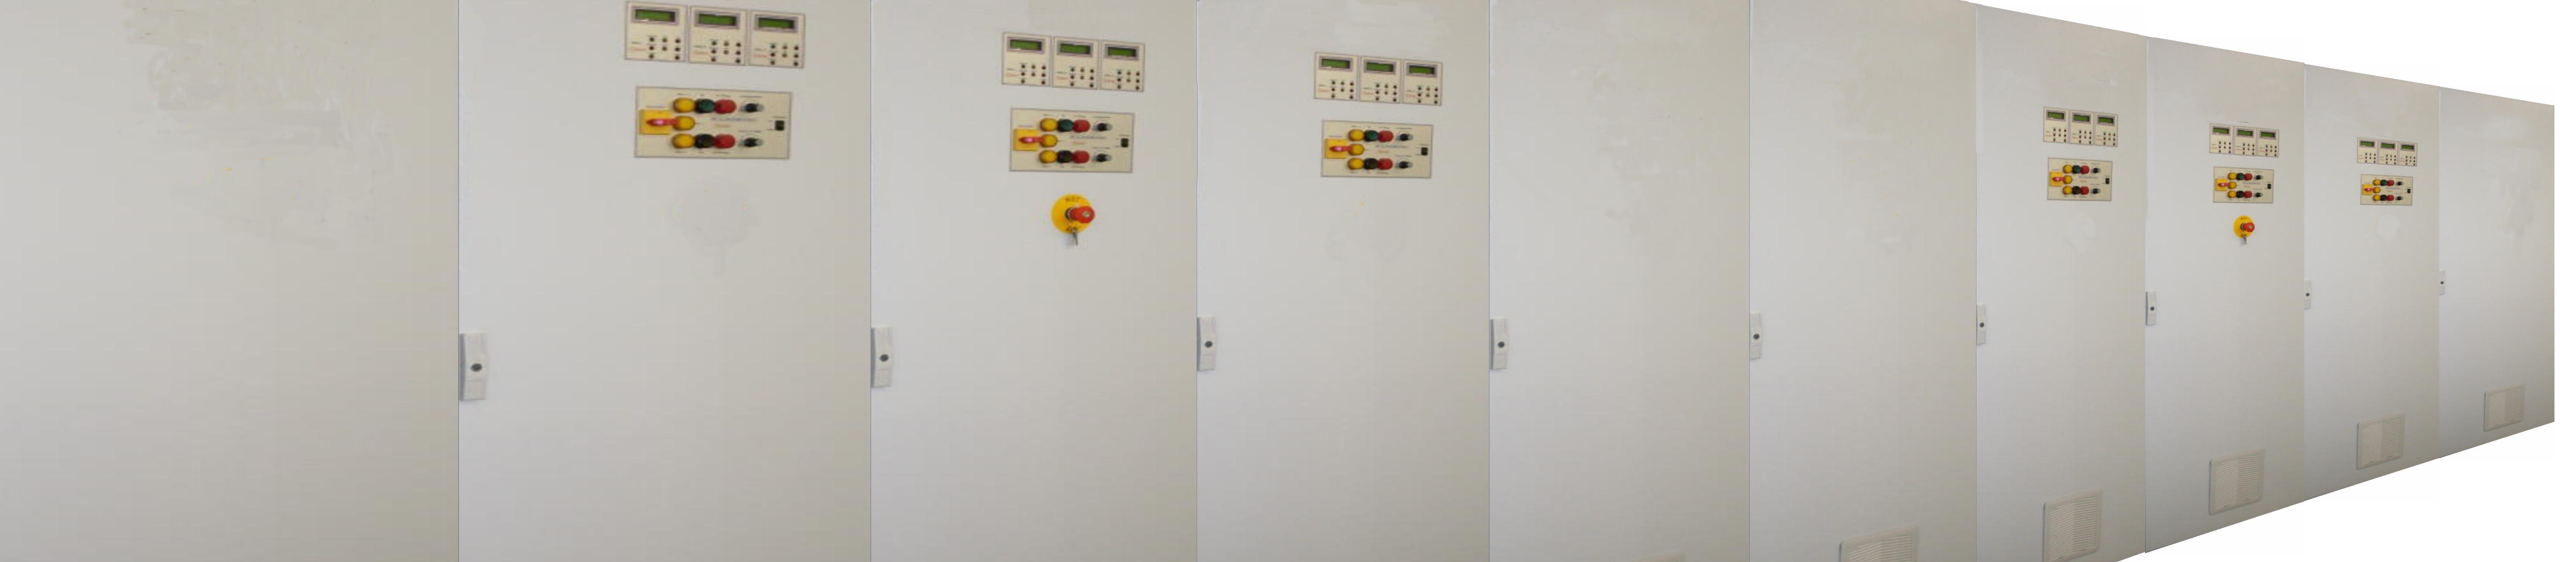 Wechselrichter bis 75 kVA